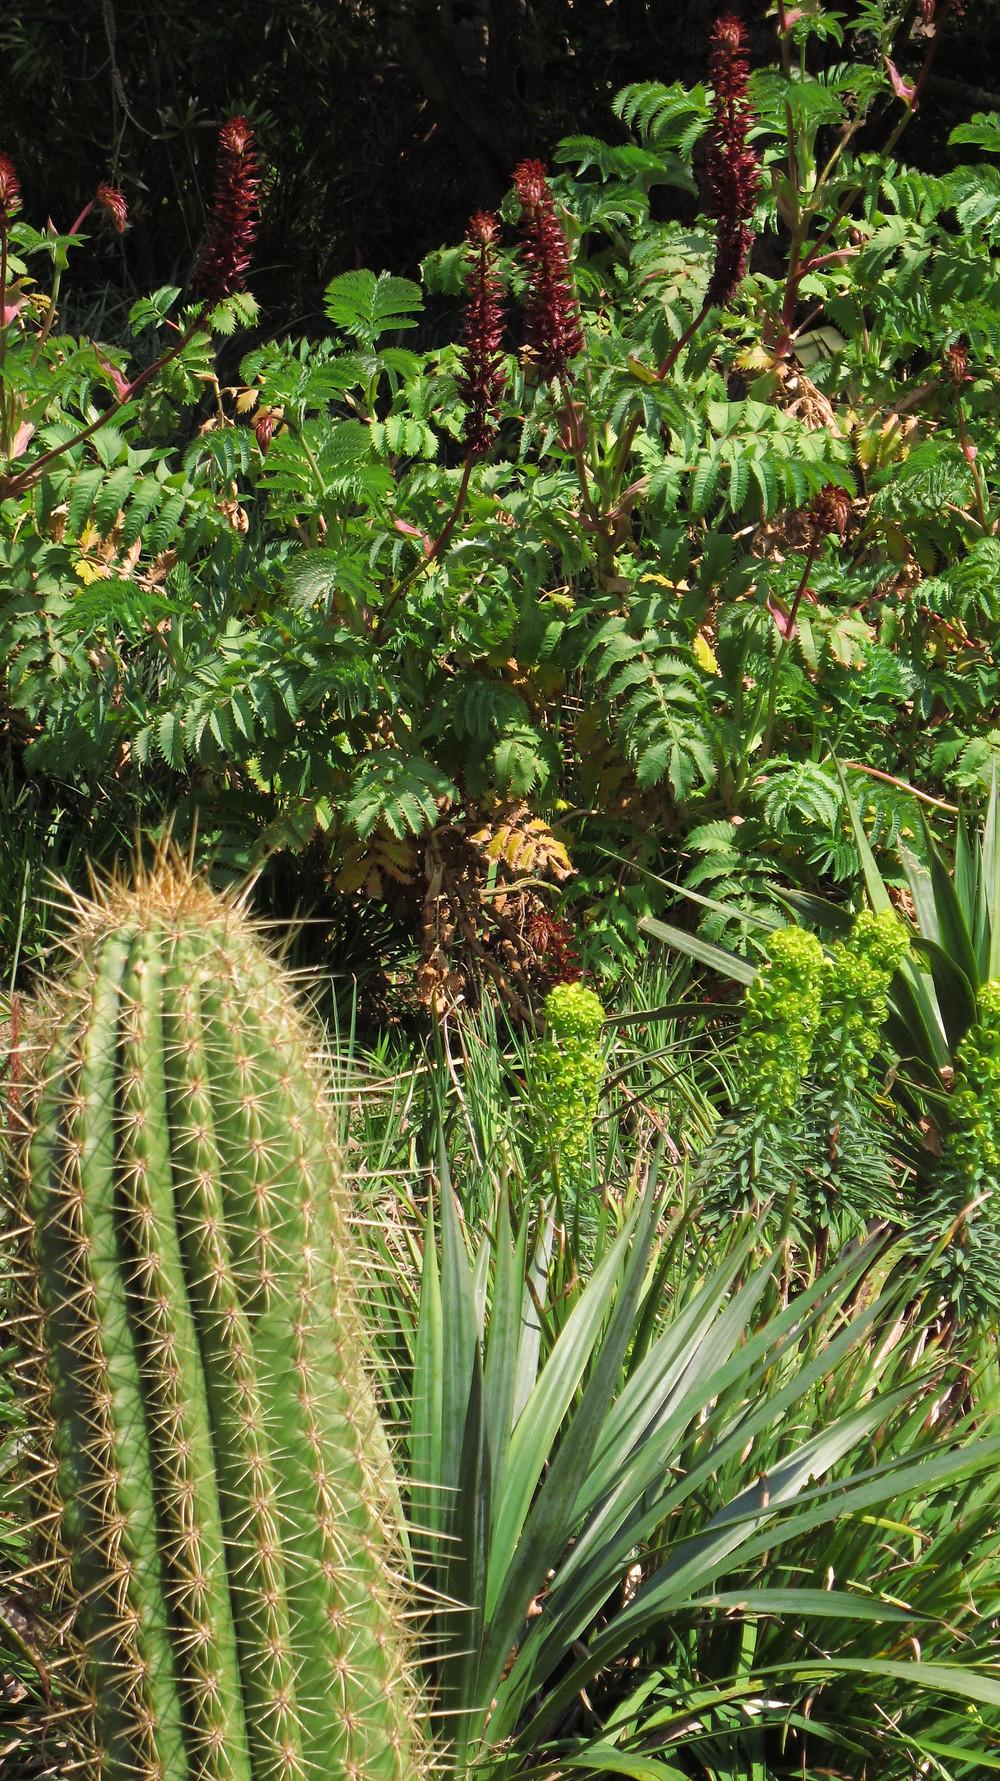 mediterannean plants, euphorbia, phormium, myrtle, devon garden, cactus, yucca,